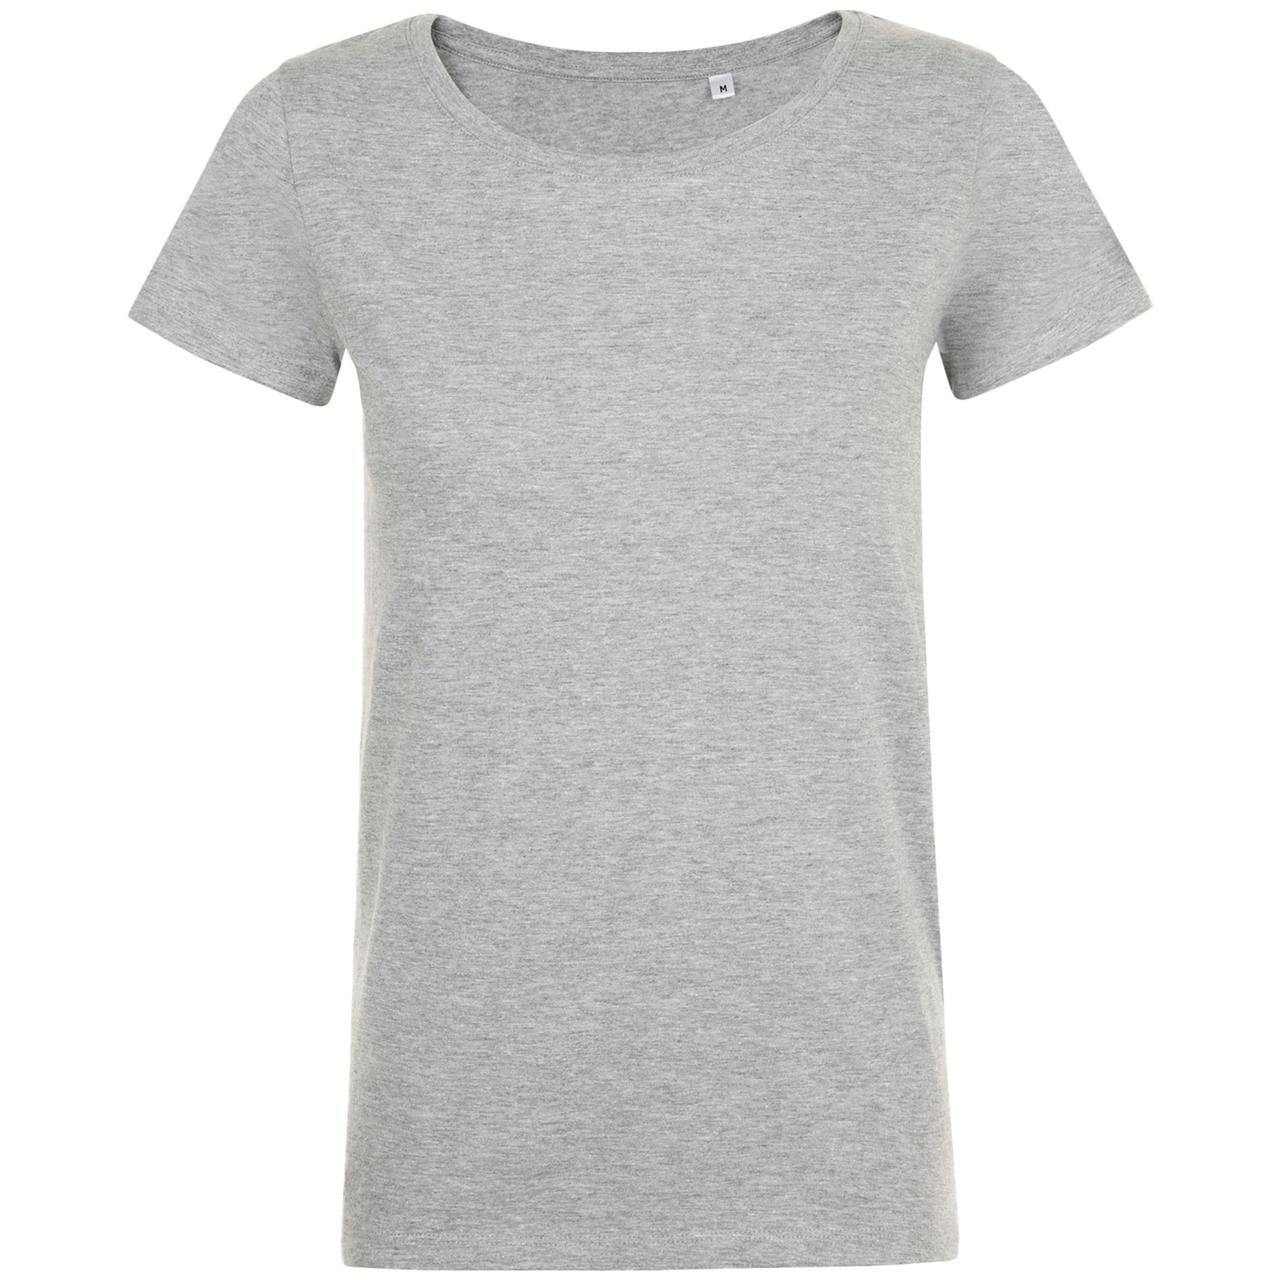 Футболка женская Mia, серый меланж (артикул 01699350)